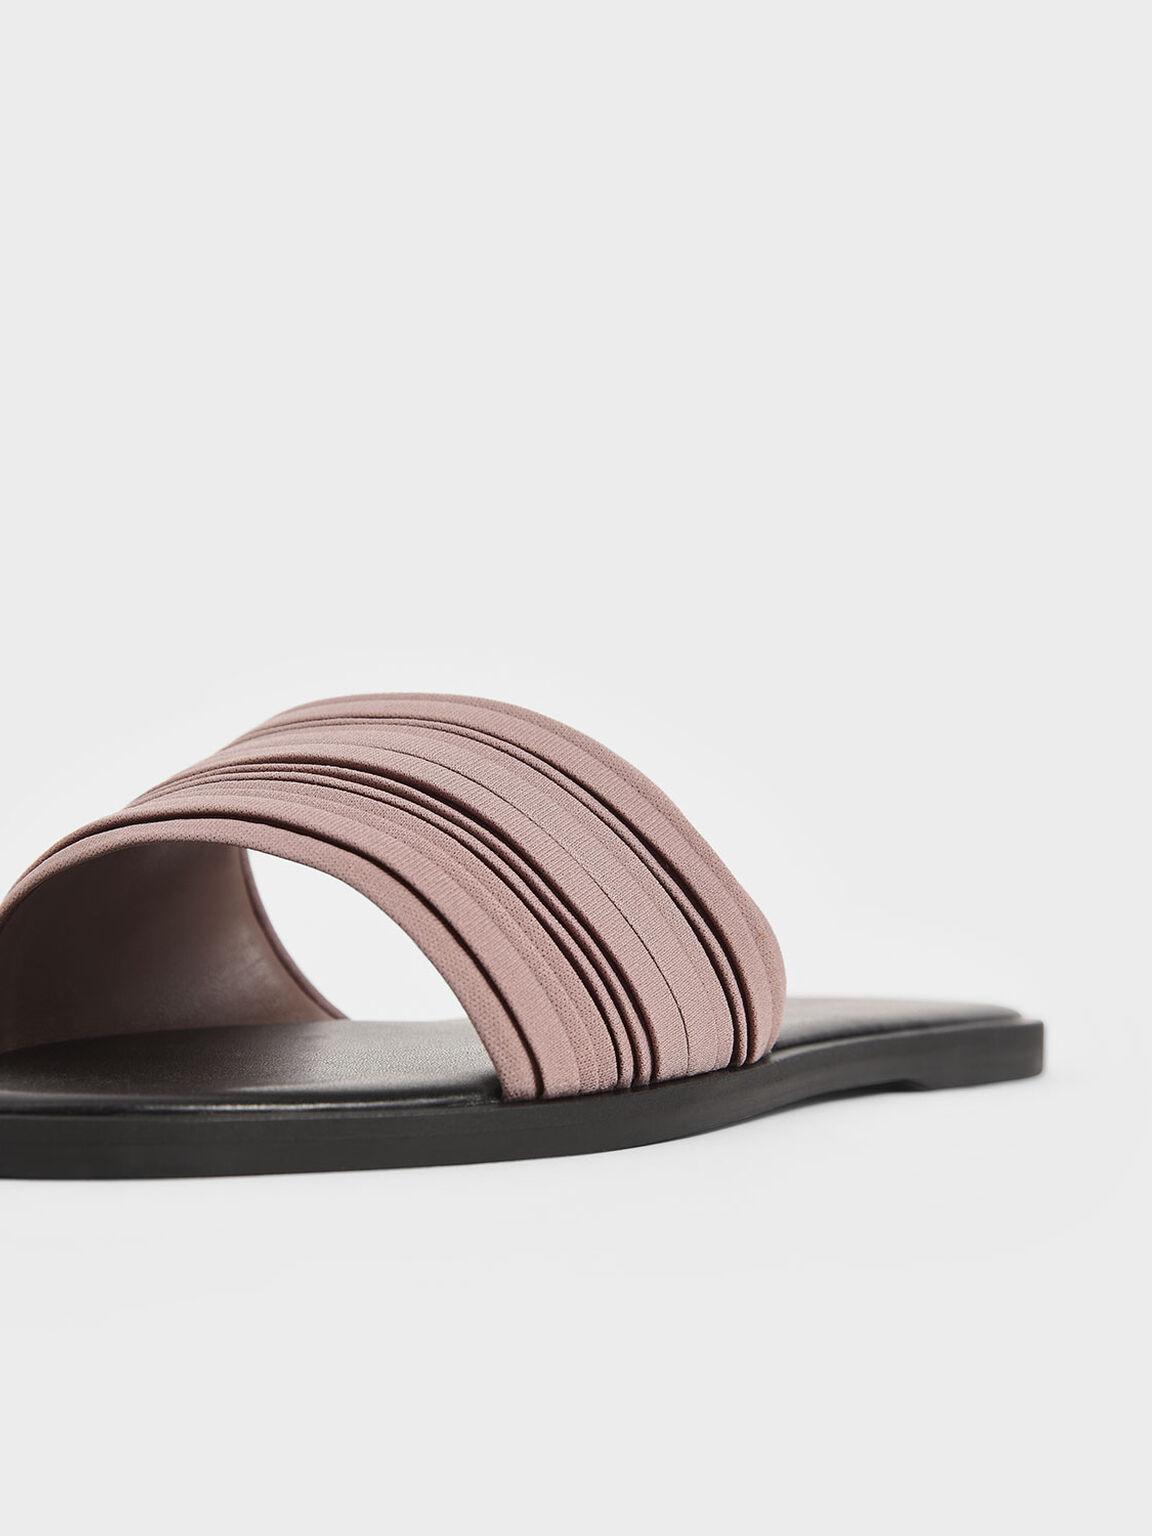 Pleated Slide Sandals, Mauve, hi-res